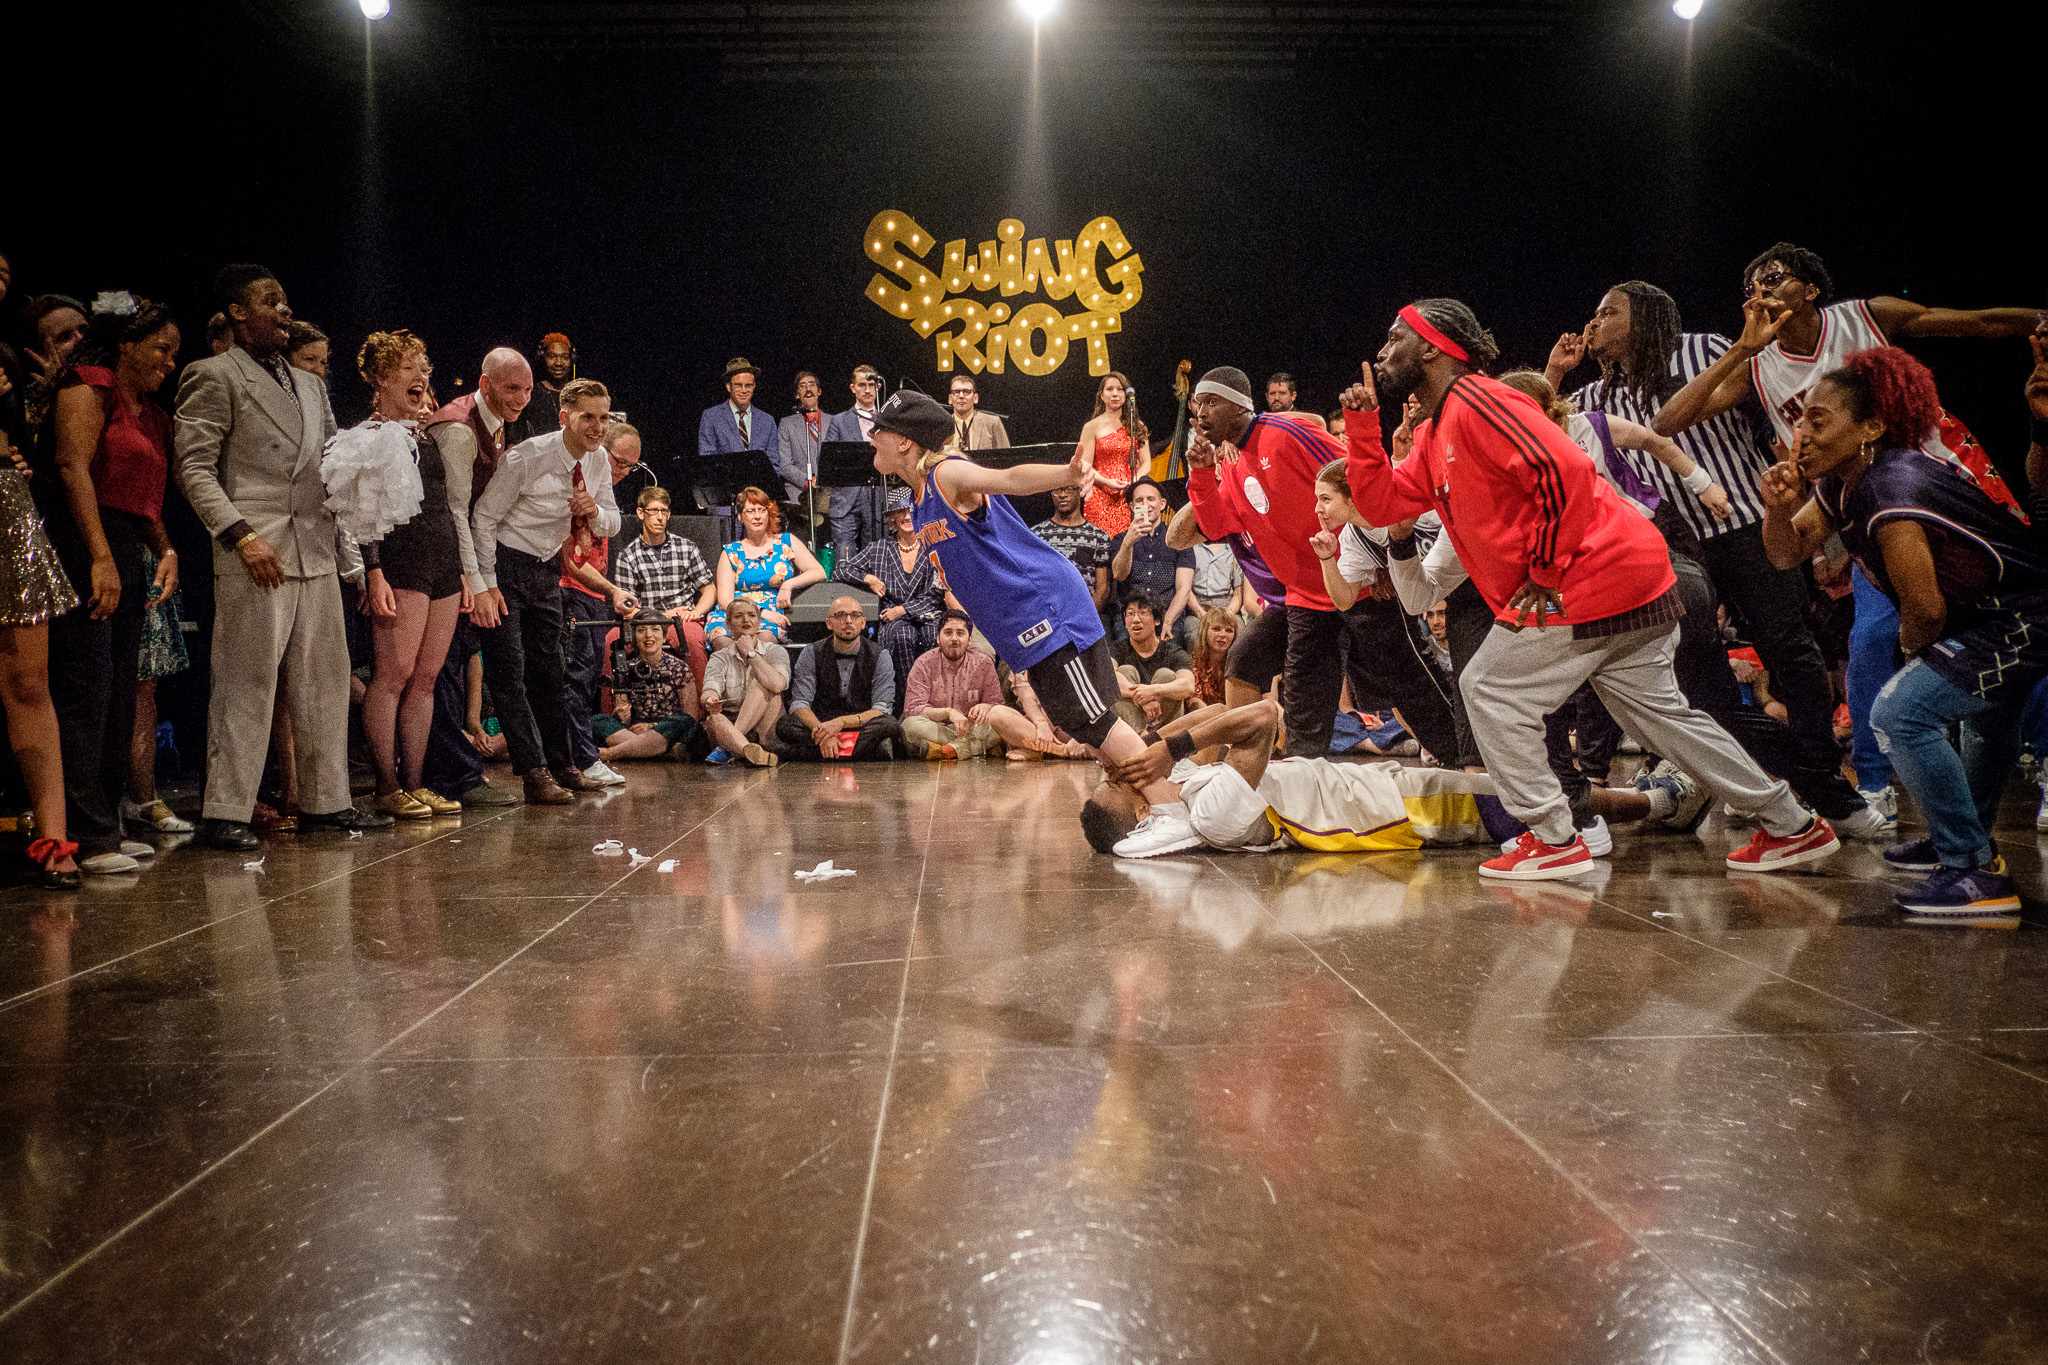 montreal-swing-riot-2011973.jpg